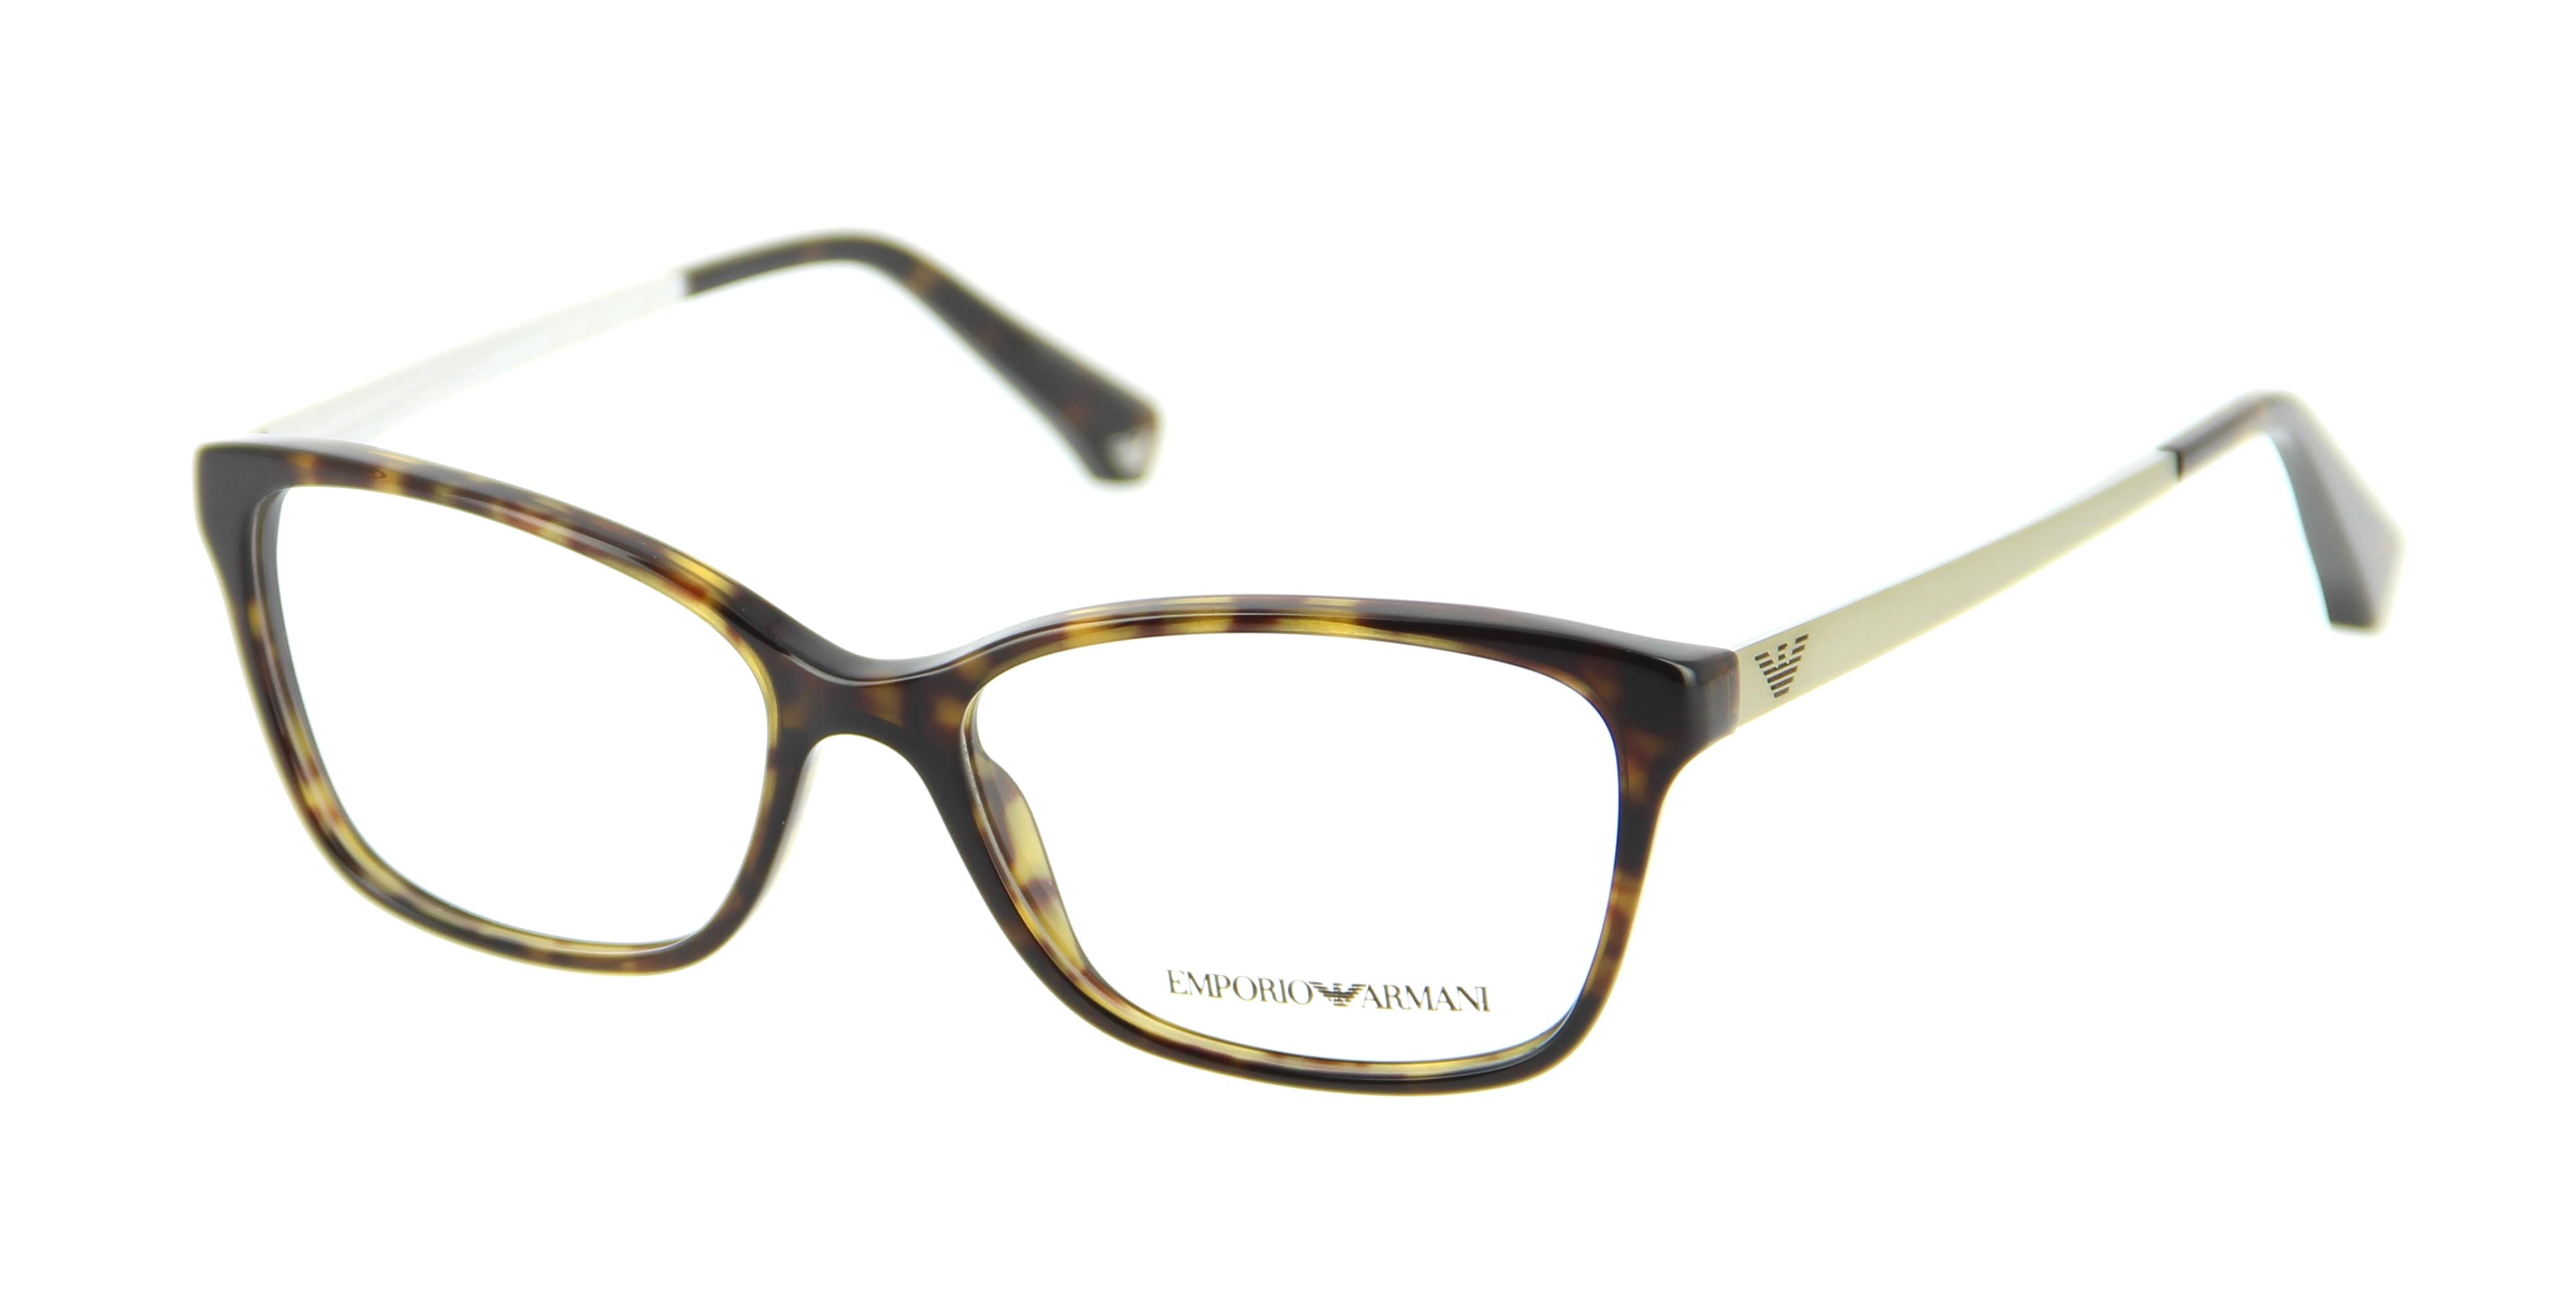 3142ebbfb28 armani lunettes femme